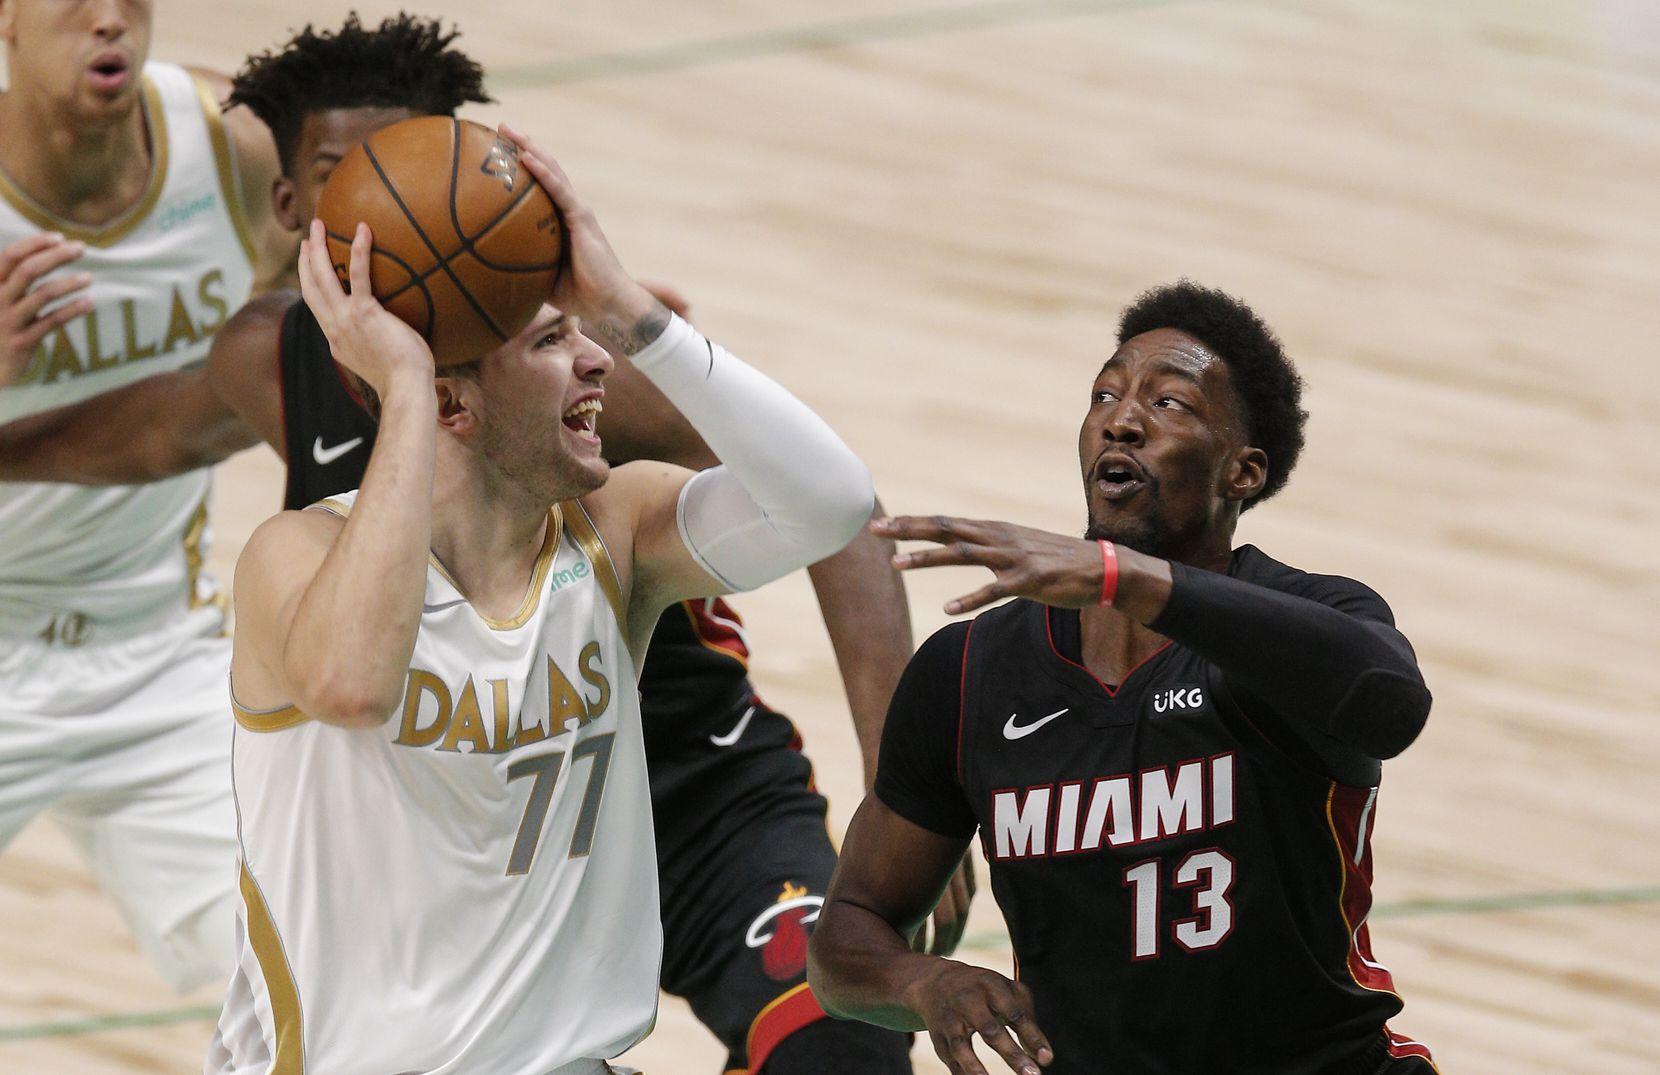 Dallas Mavericks guard Luka Doncic (77) attempts a shot as Miami Heat forward Bam Adebayo (13) defends during the first half of an NBA basketball game, Friday, January 1, 2021. (Brandon Wade/Special Contributor)